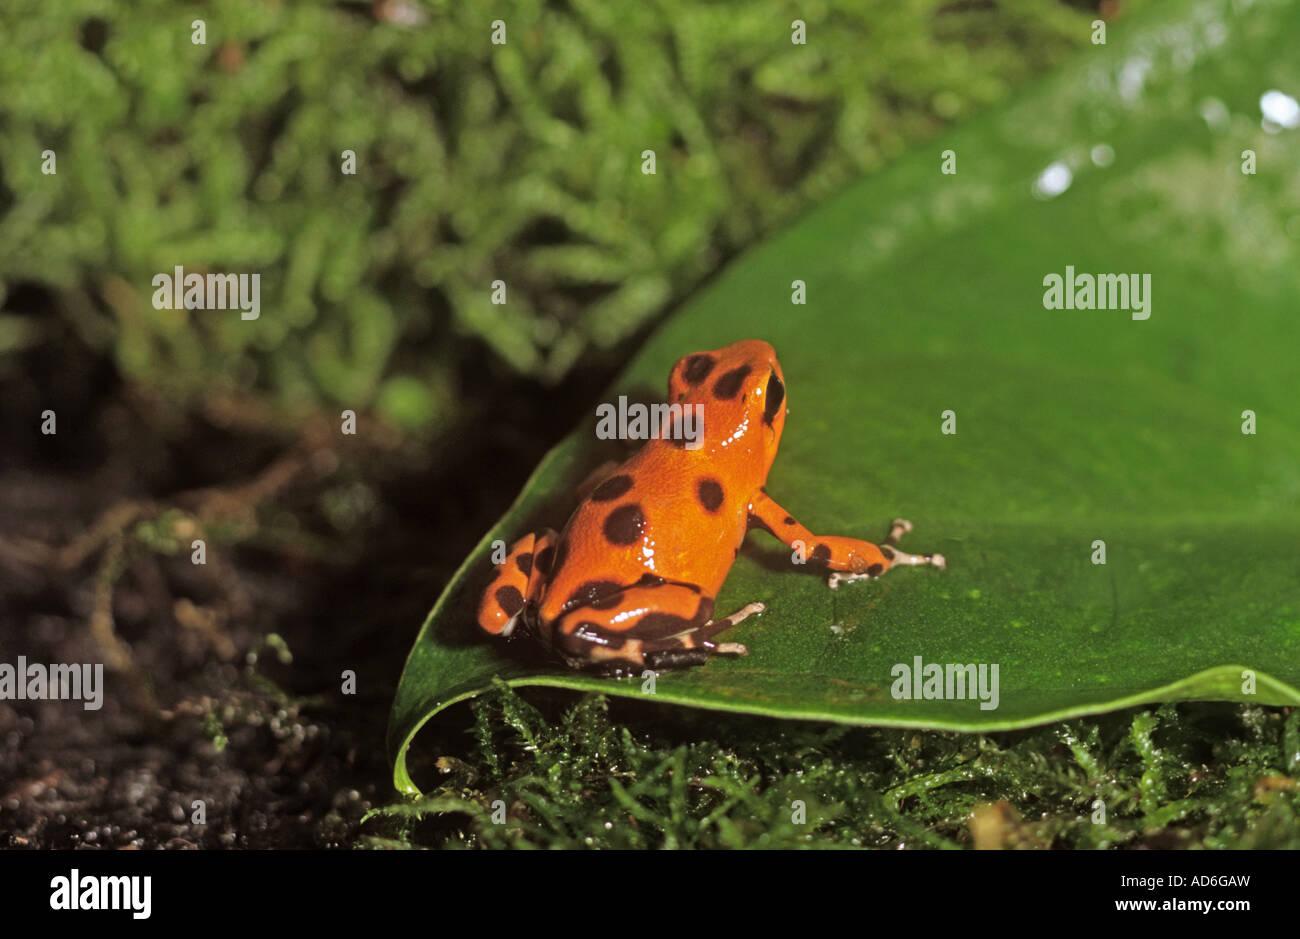 Strawberry poison Dart frog / Dendrobates pumilio - Stock Image